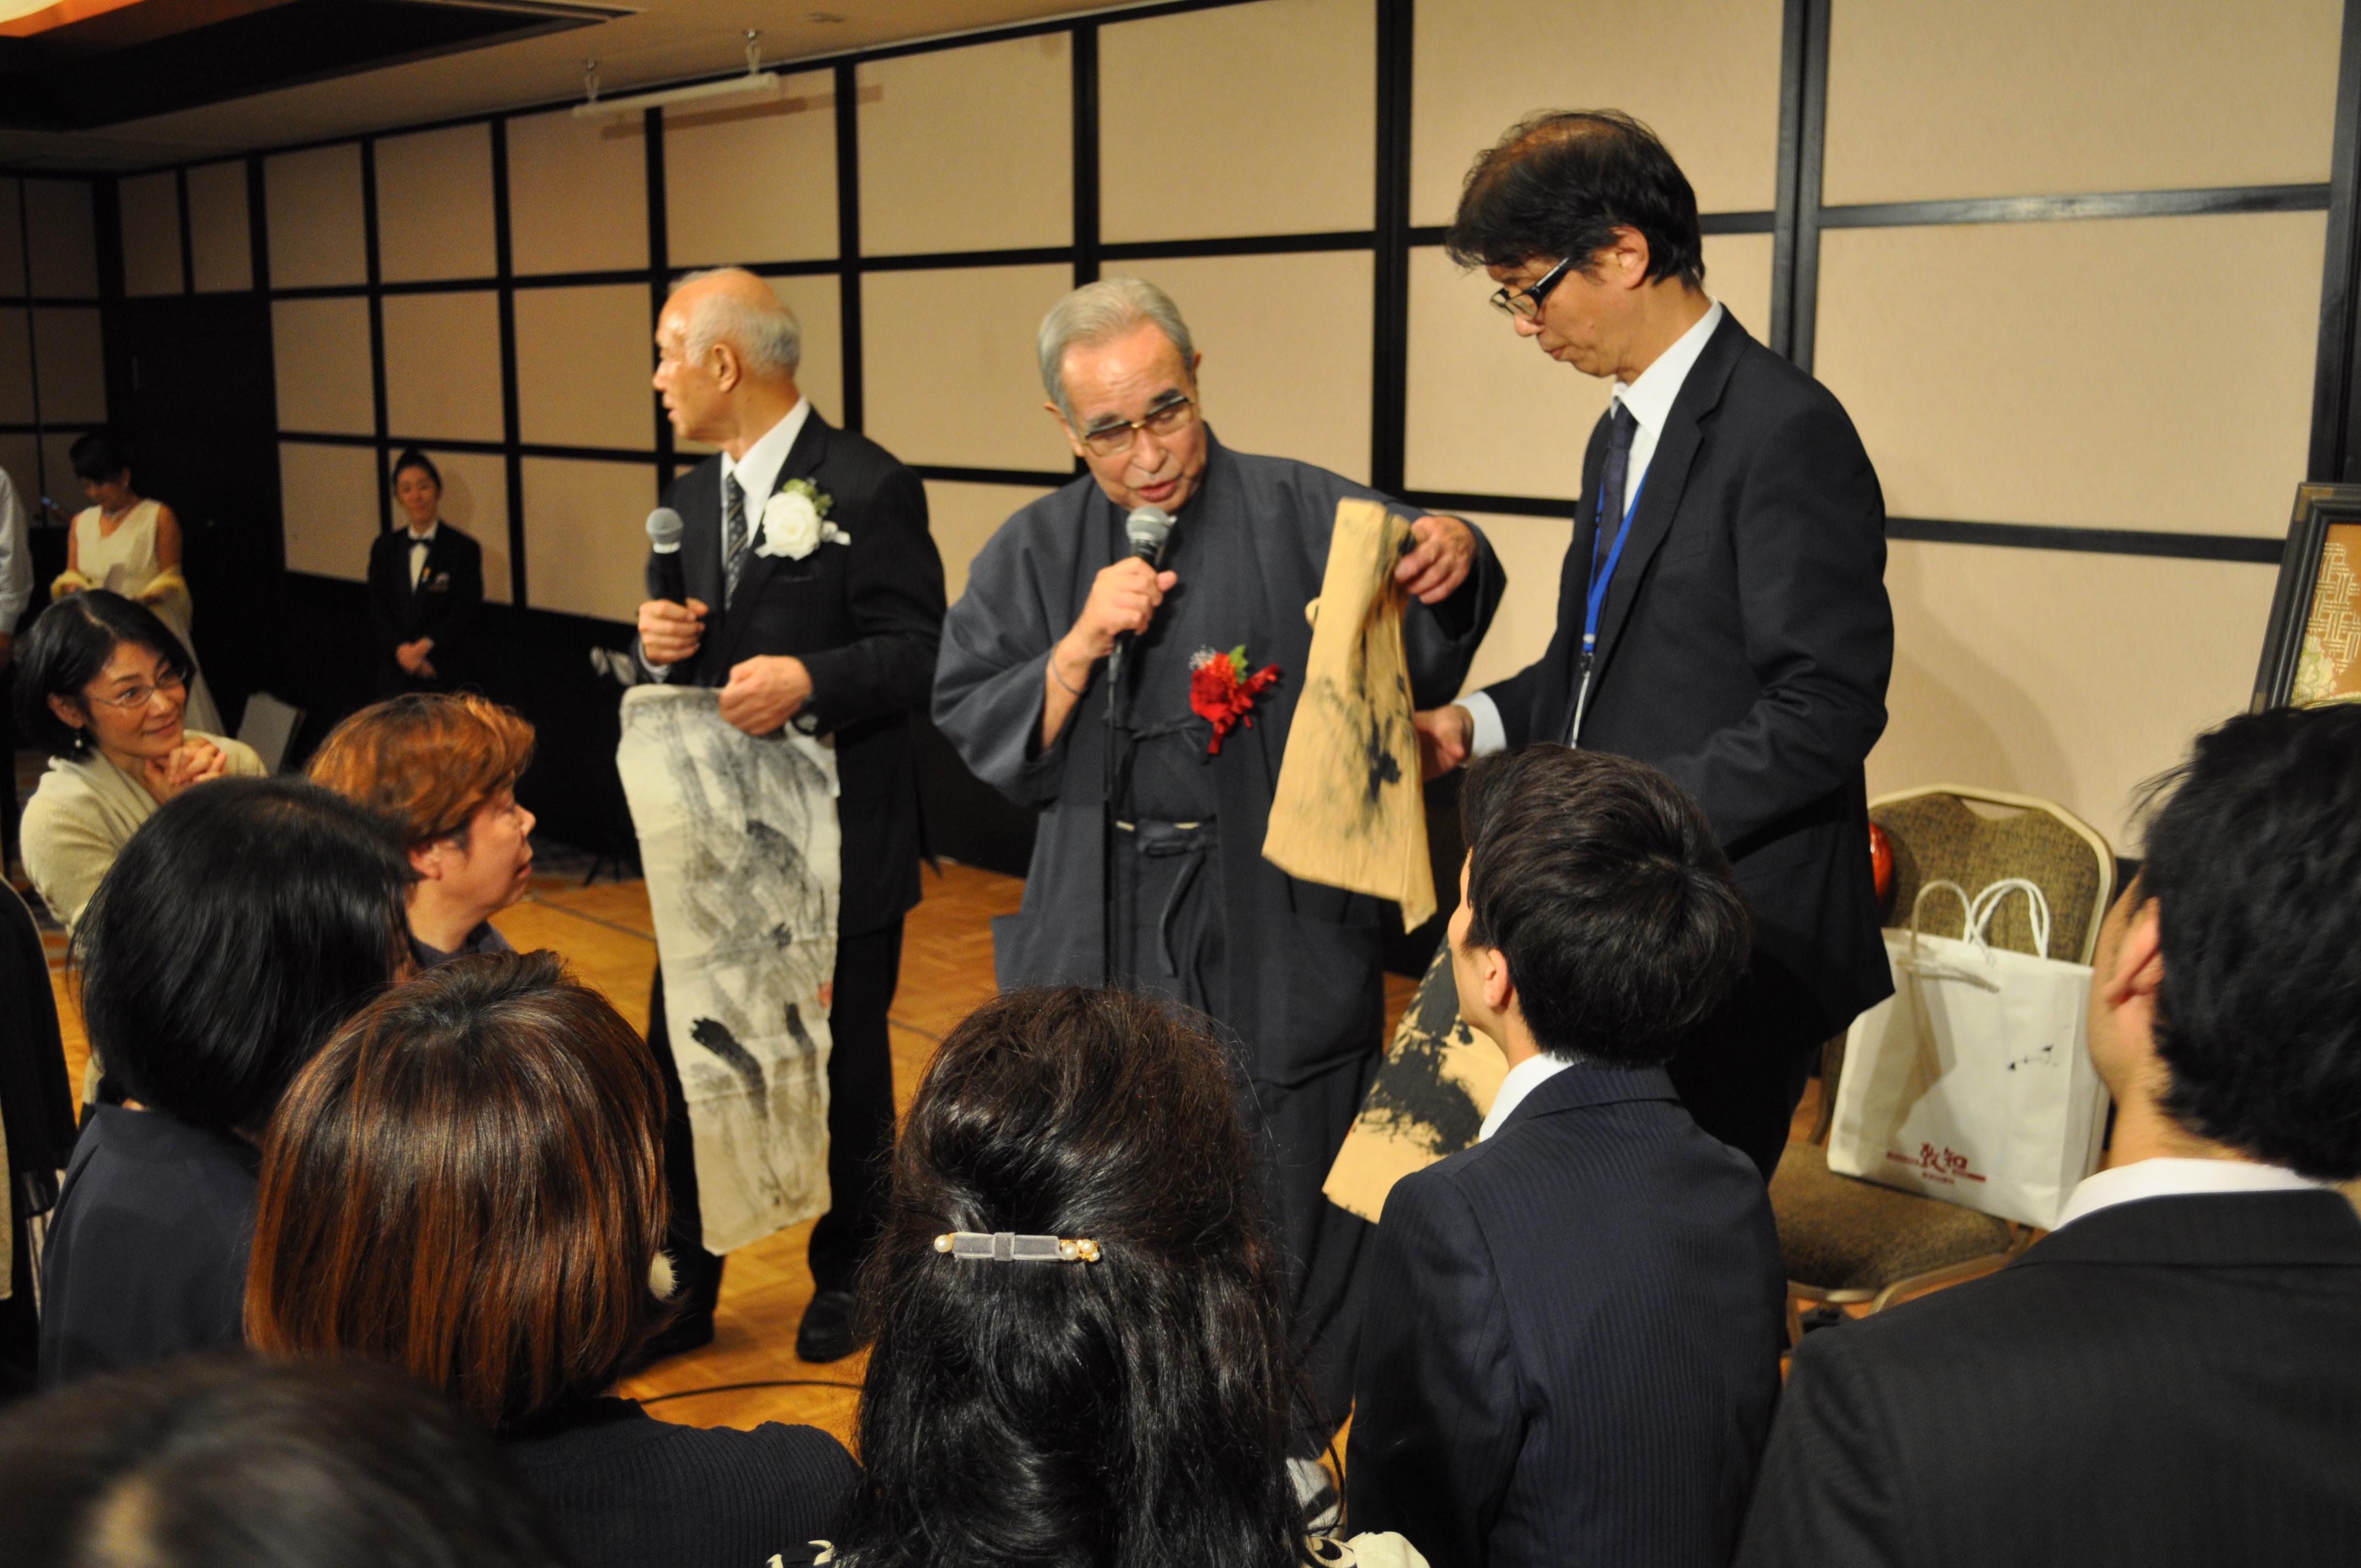 DSC 0593 - 第6回思風会全国大会2018in東京開催